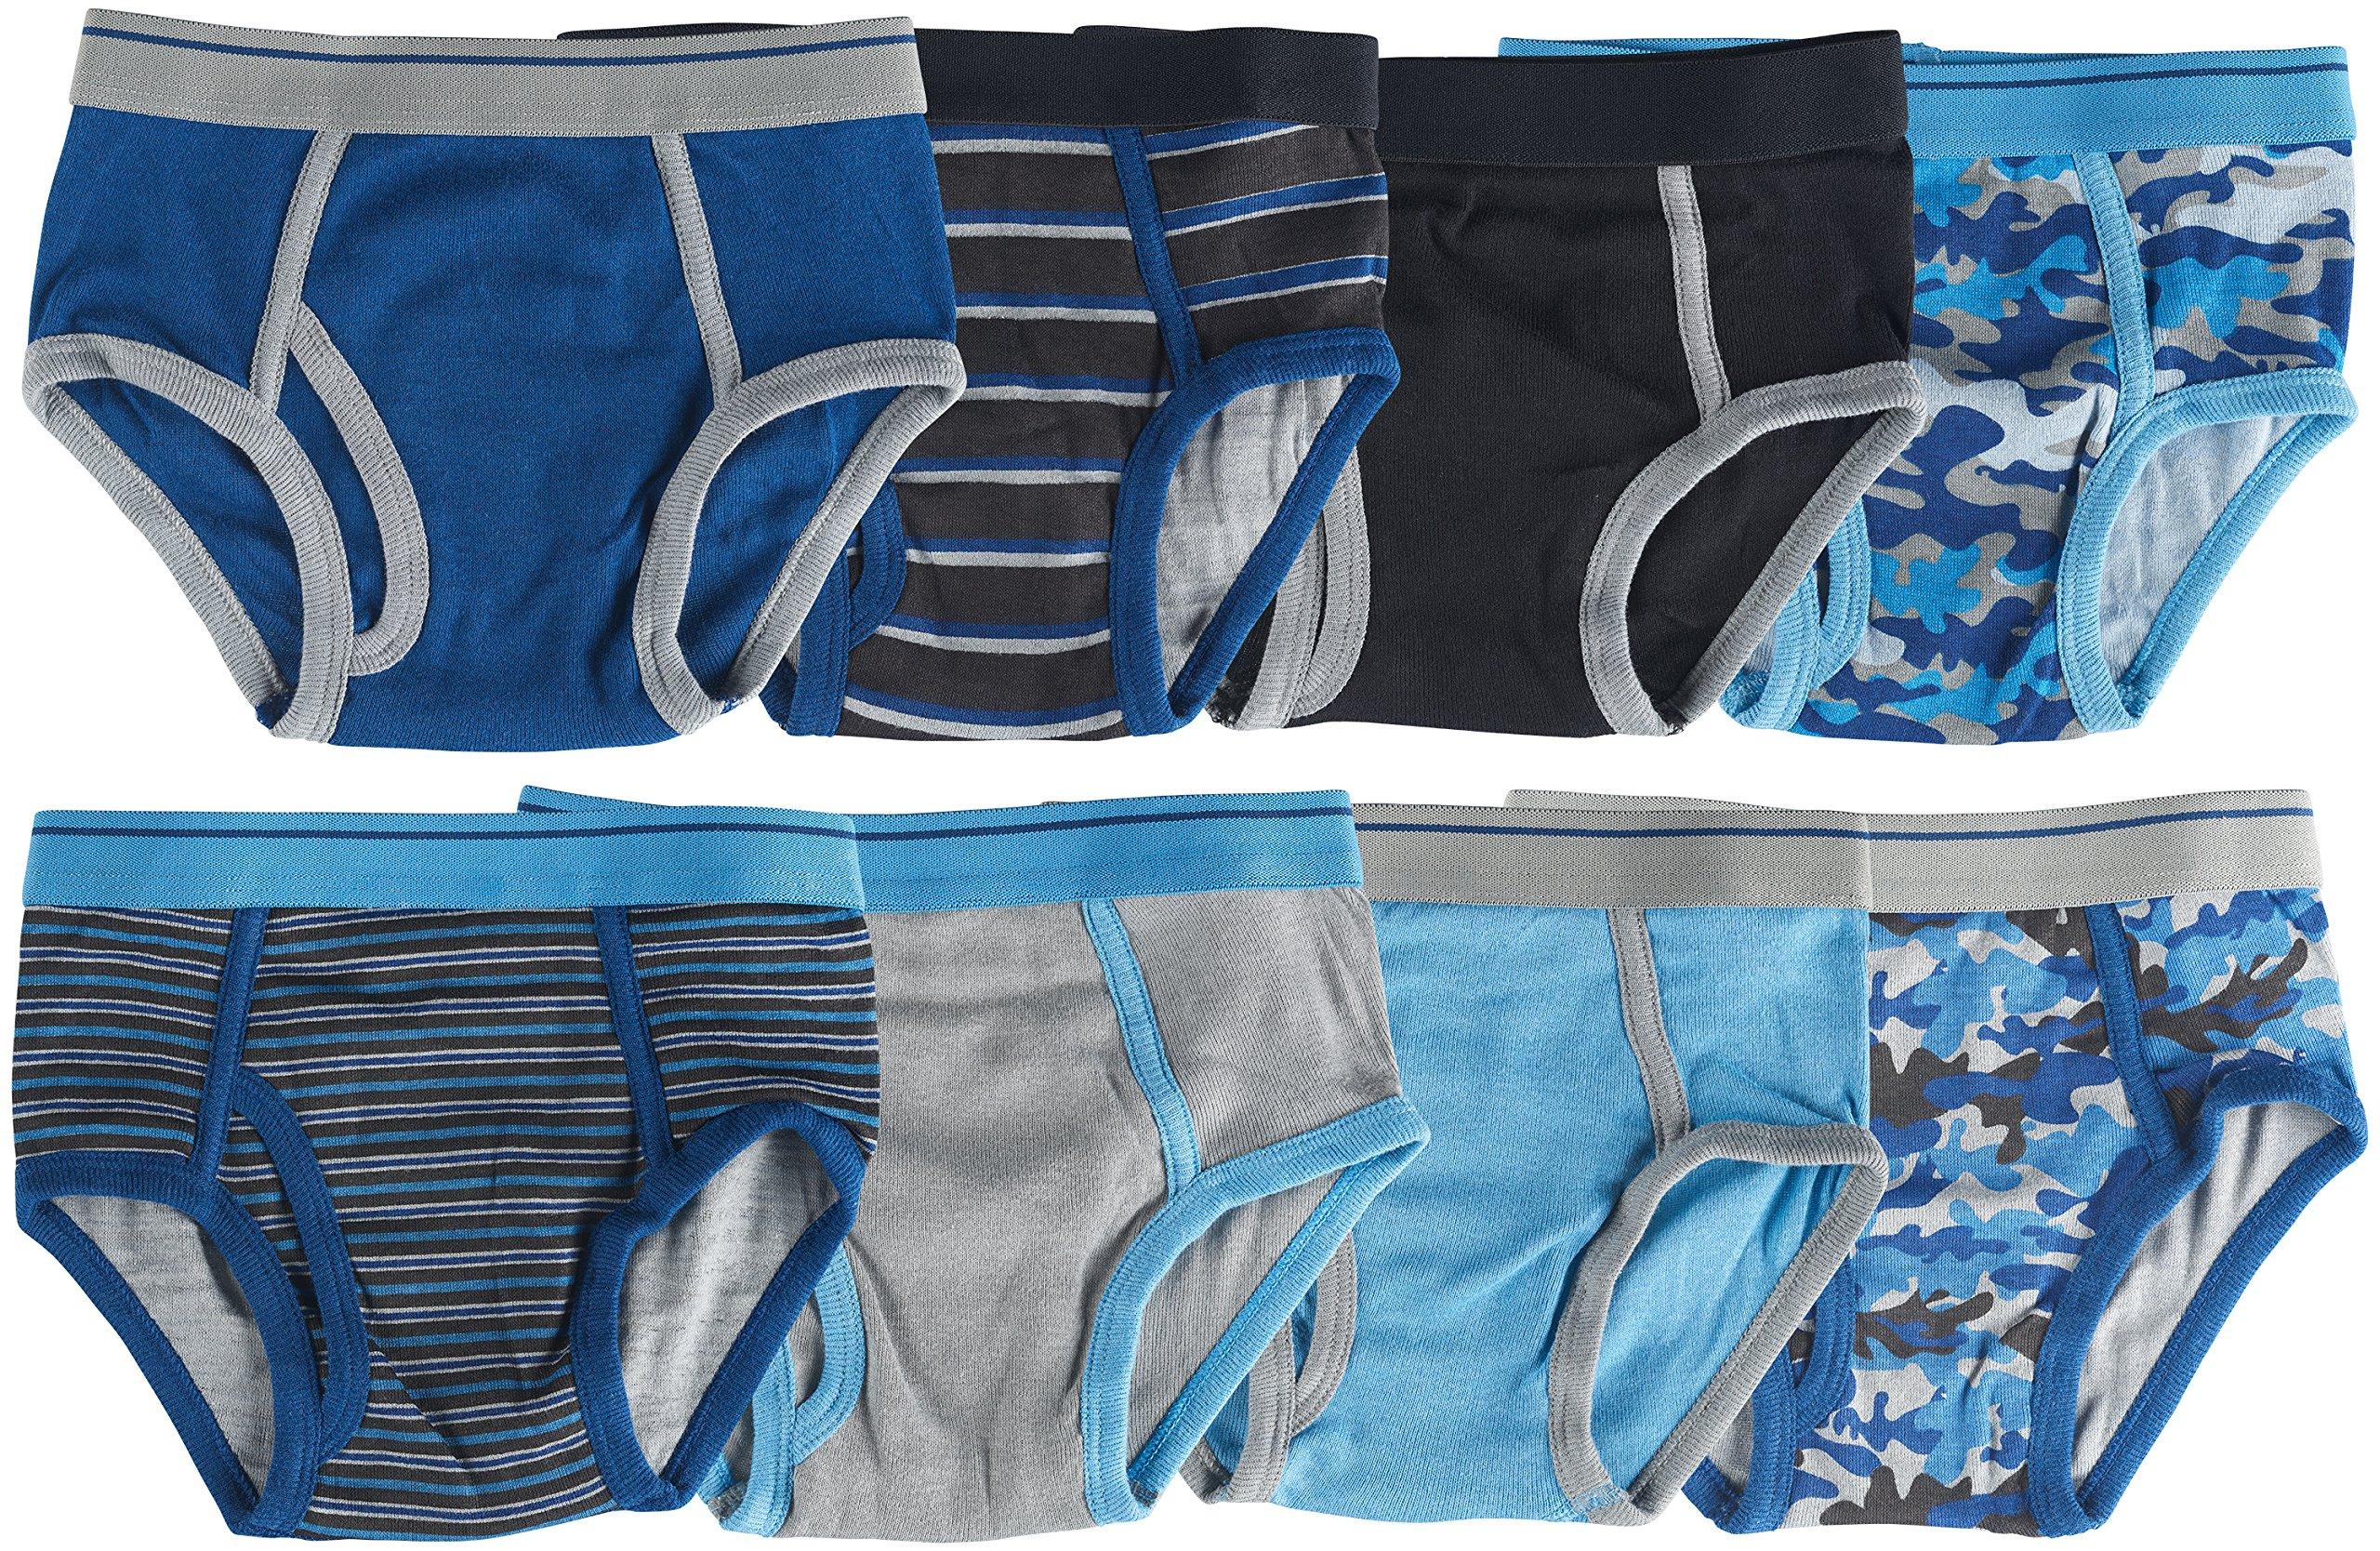 Trimfit Boys 100% Dinosaur Sports Camo Briefs 8-Pack Blue/Grey Multi Color S (4-6) by Trimfit